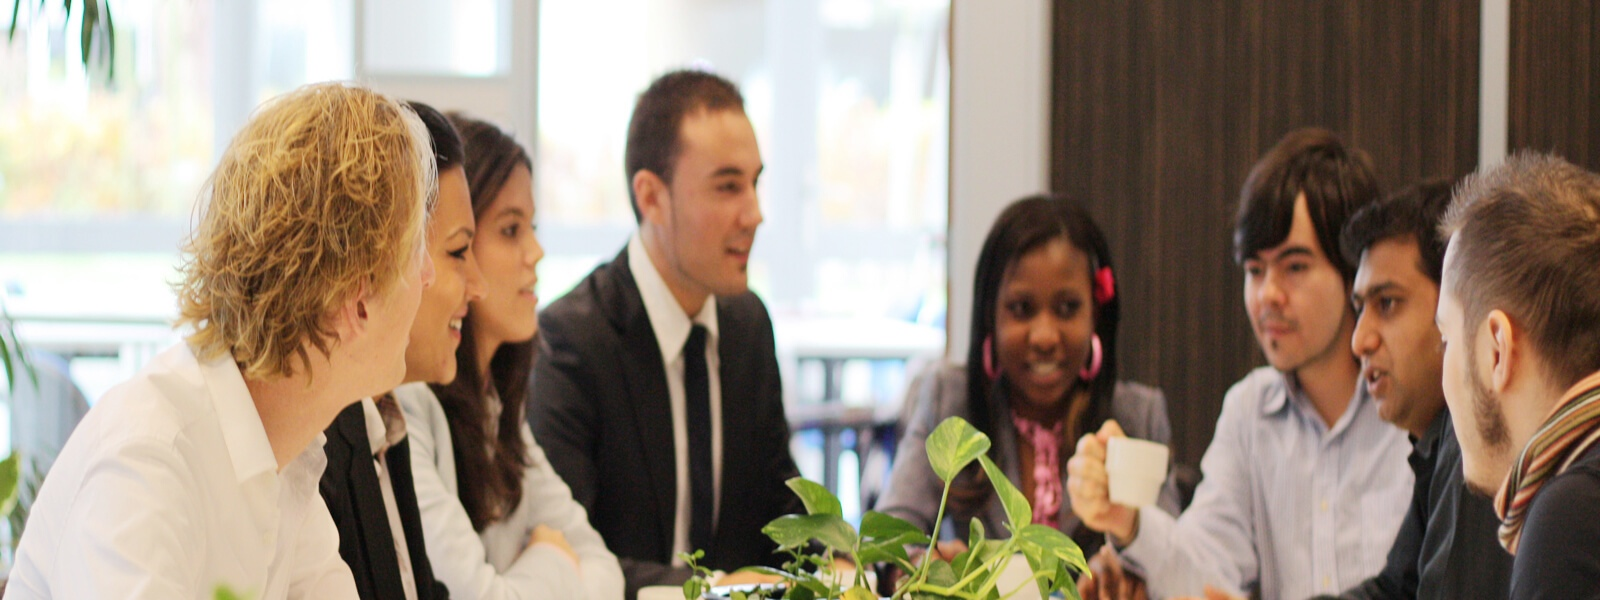 MBA master in Clean Technology Management- studyinholland-universitiesofappliedsciences-wittenborg-apeldoorn-holland